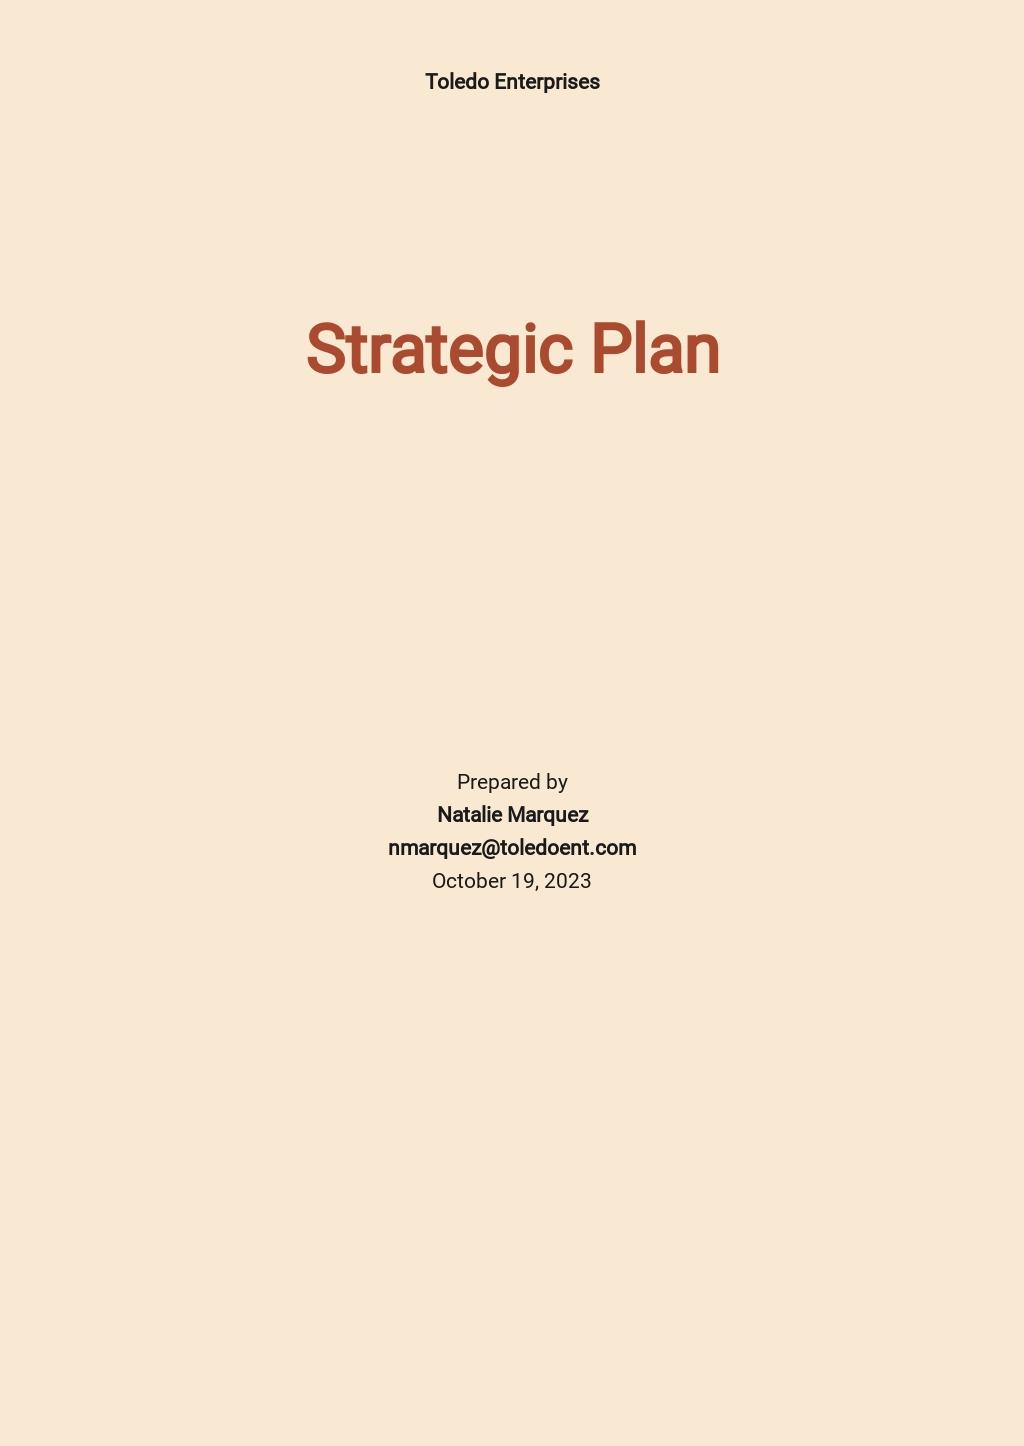 Data Strategy Plan Template